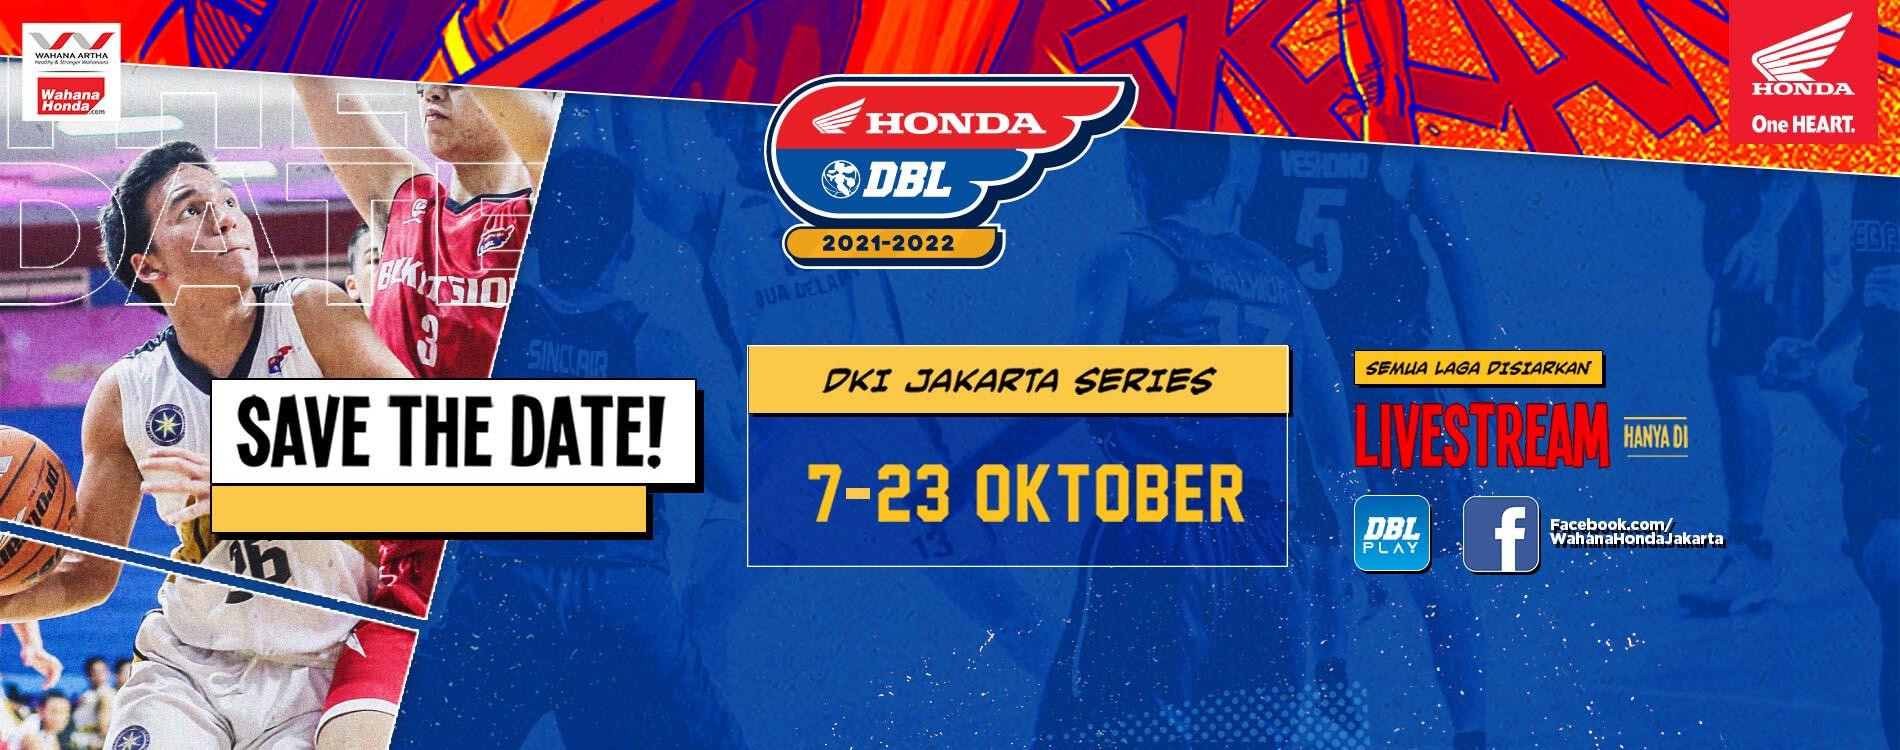 Honda DBL Jakarta Series 2021 - 2022